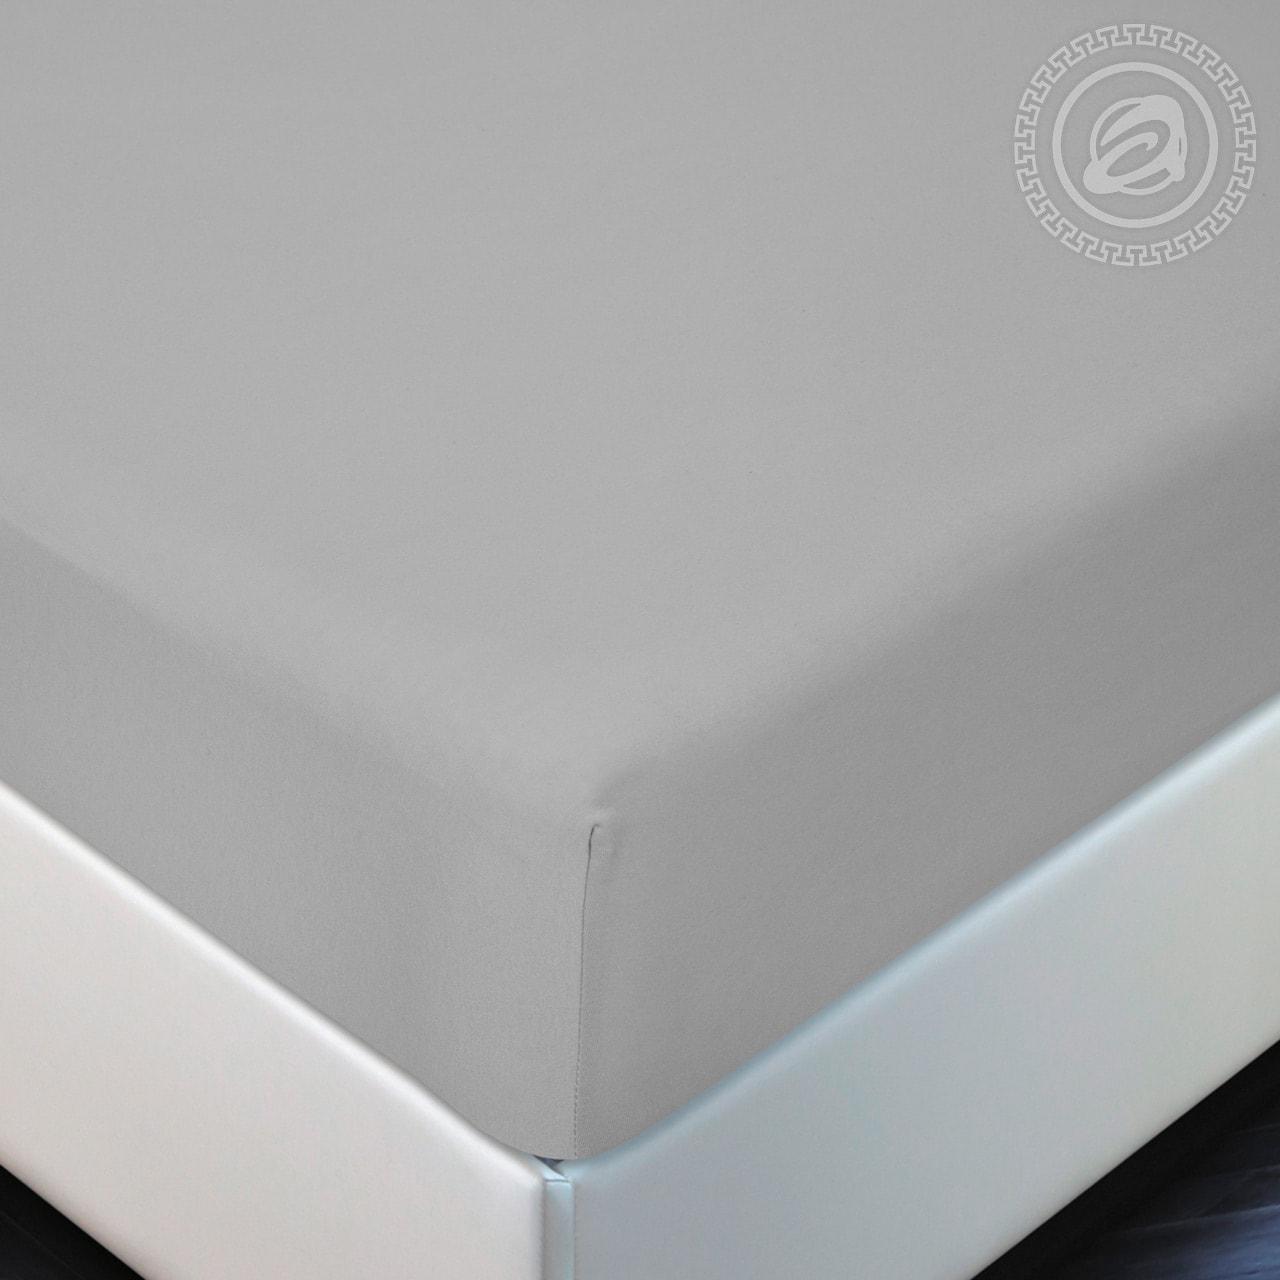 Простыня на резинке Серый (трикотаж) (90х200) простыни valtery простыня на резинке brant 90х200